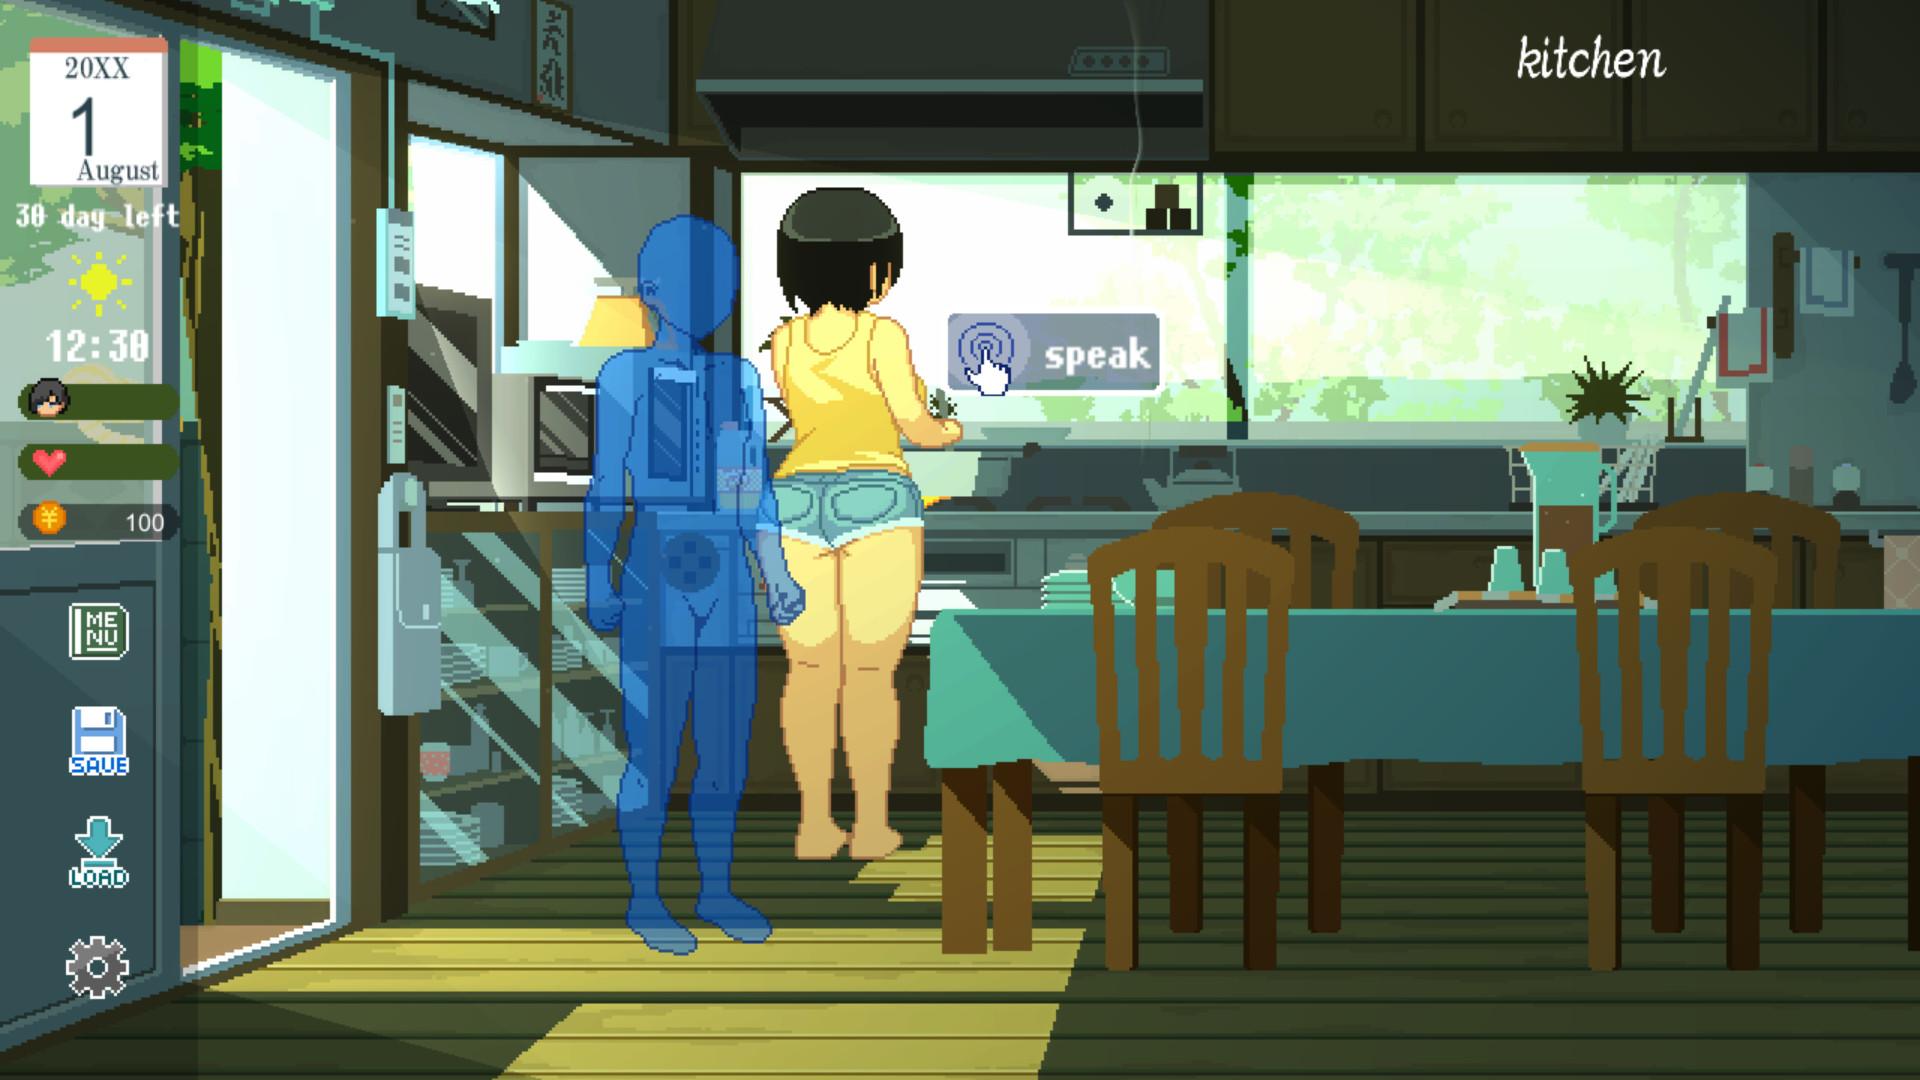 夏日乡村生活〜愉快的暑假 Summer~Life in the Countryside~(V1.01)插图11